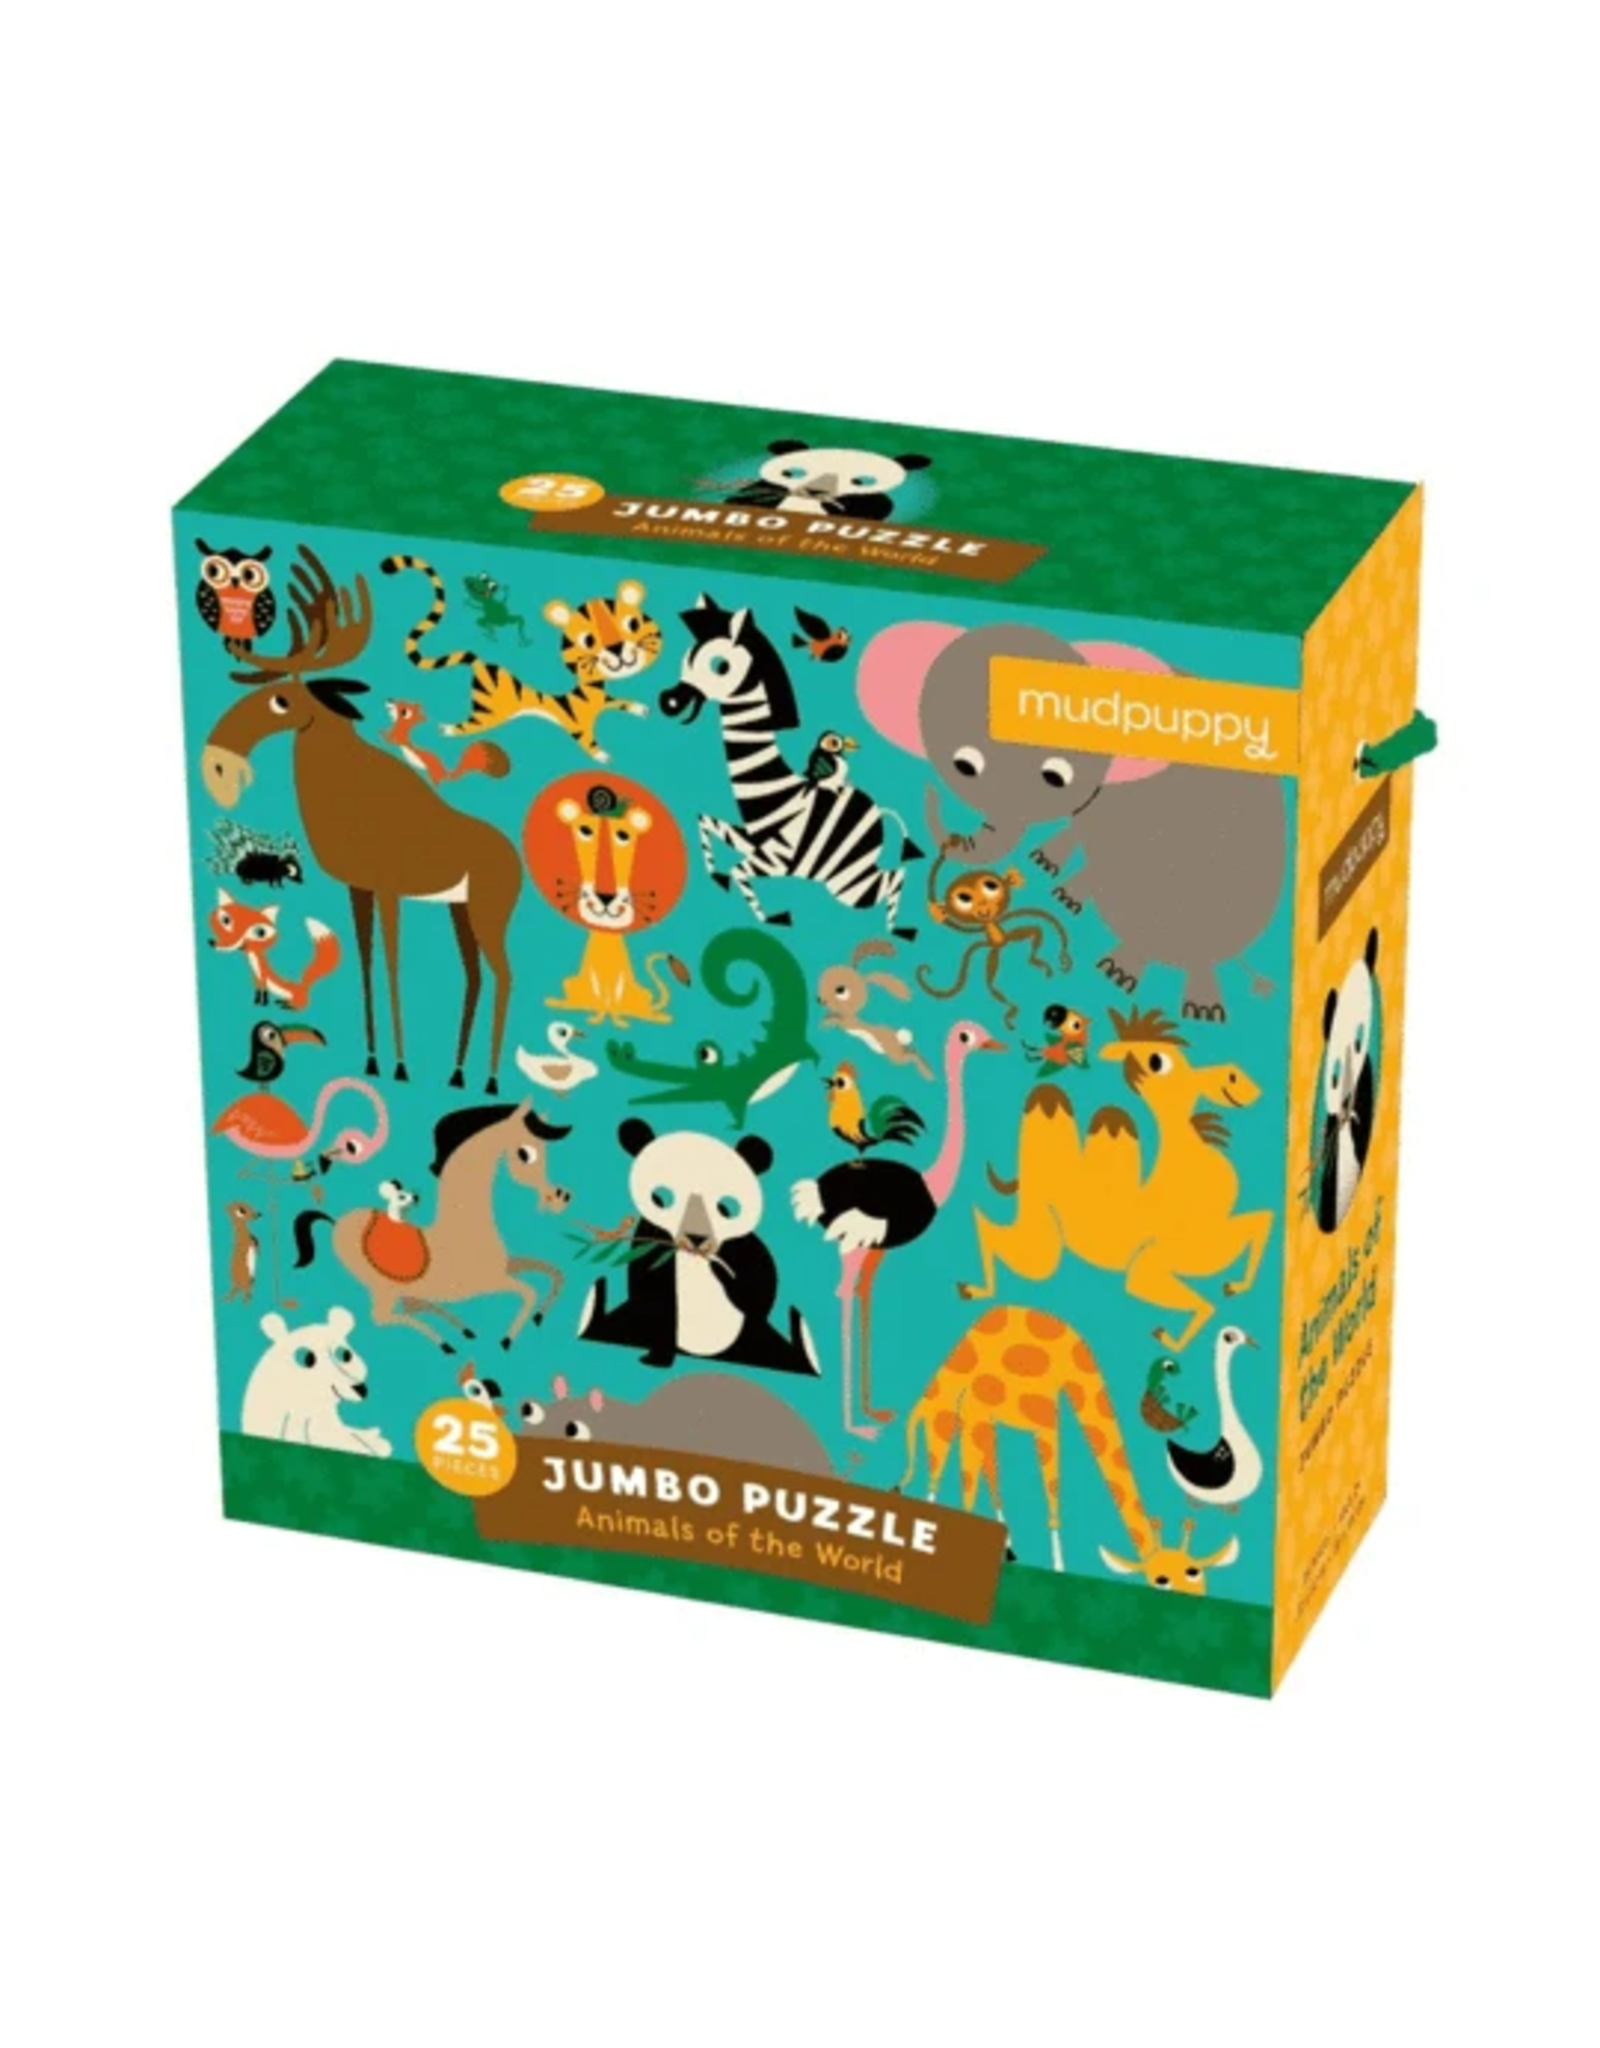 Mudpuppy Animals of the World Jumbo Puzzle 25 Piece